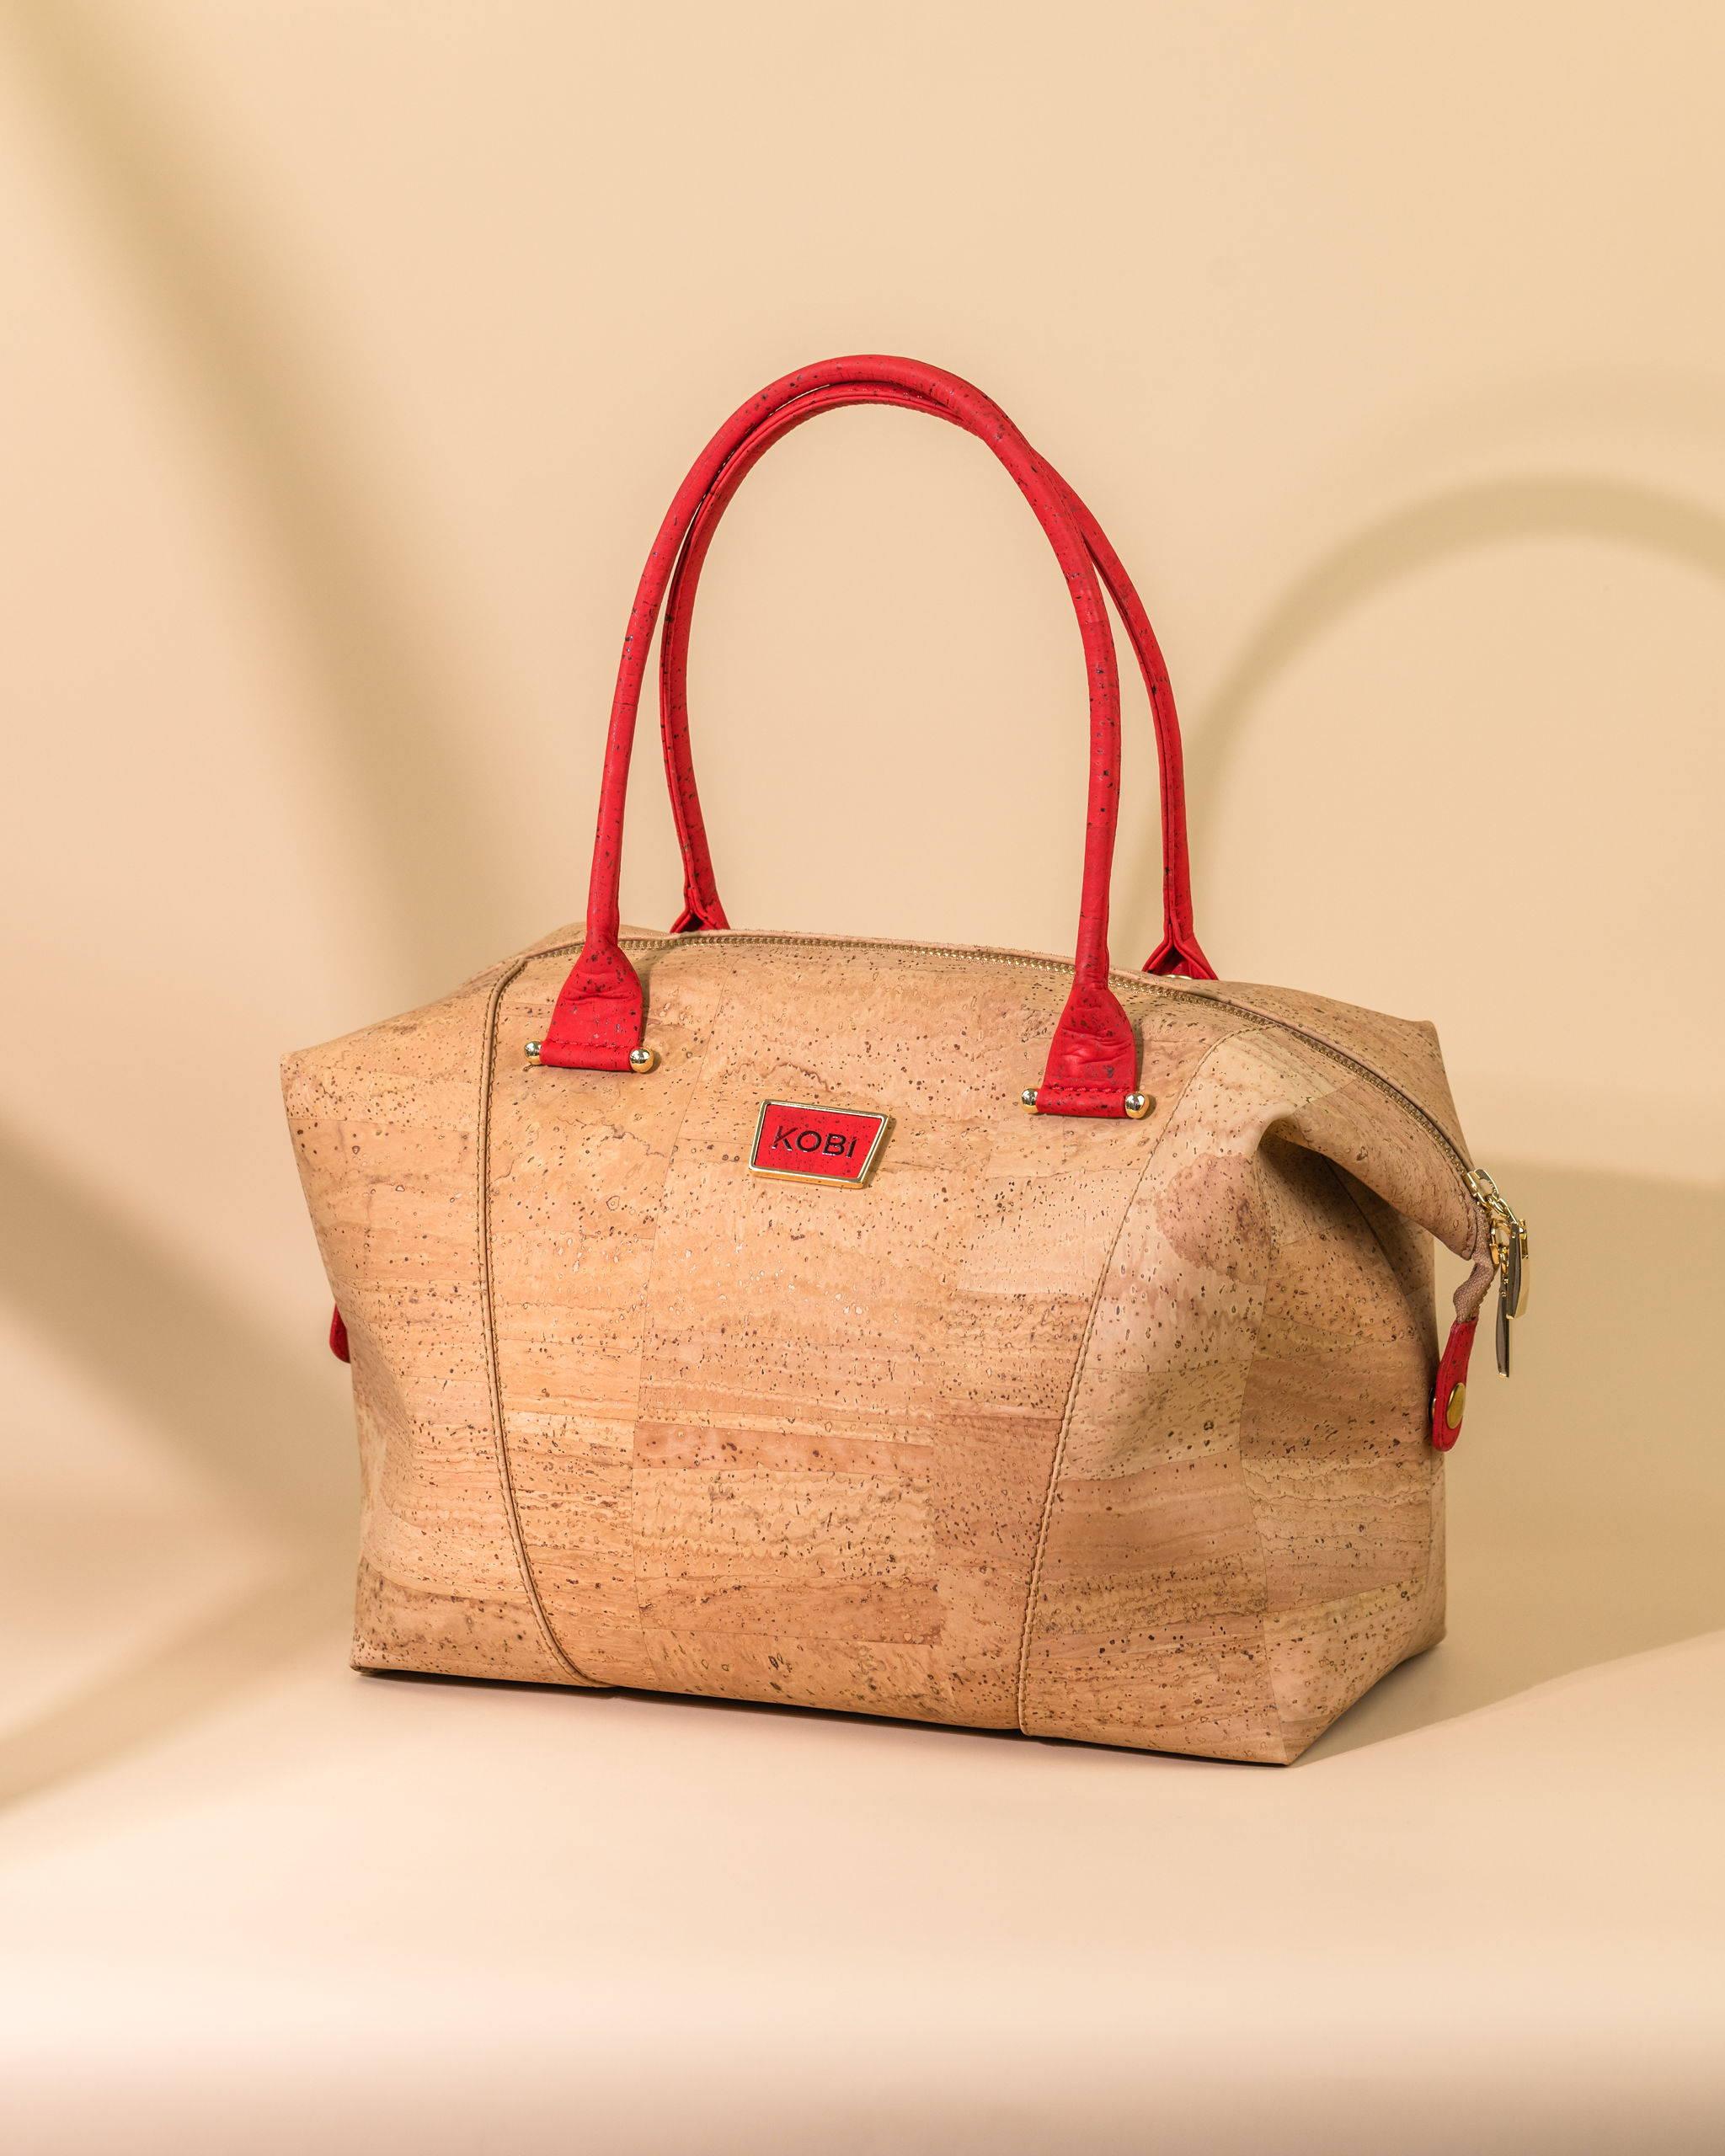 Natural cork bowler bag with red handles and KOBI branding